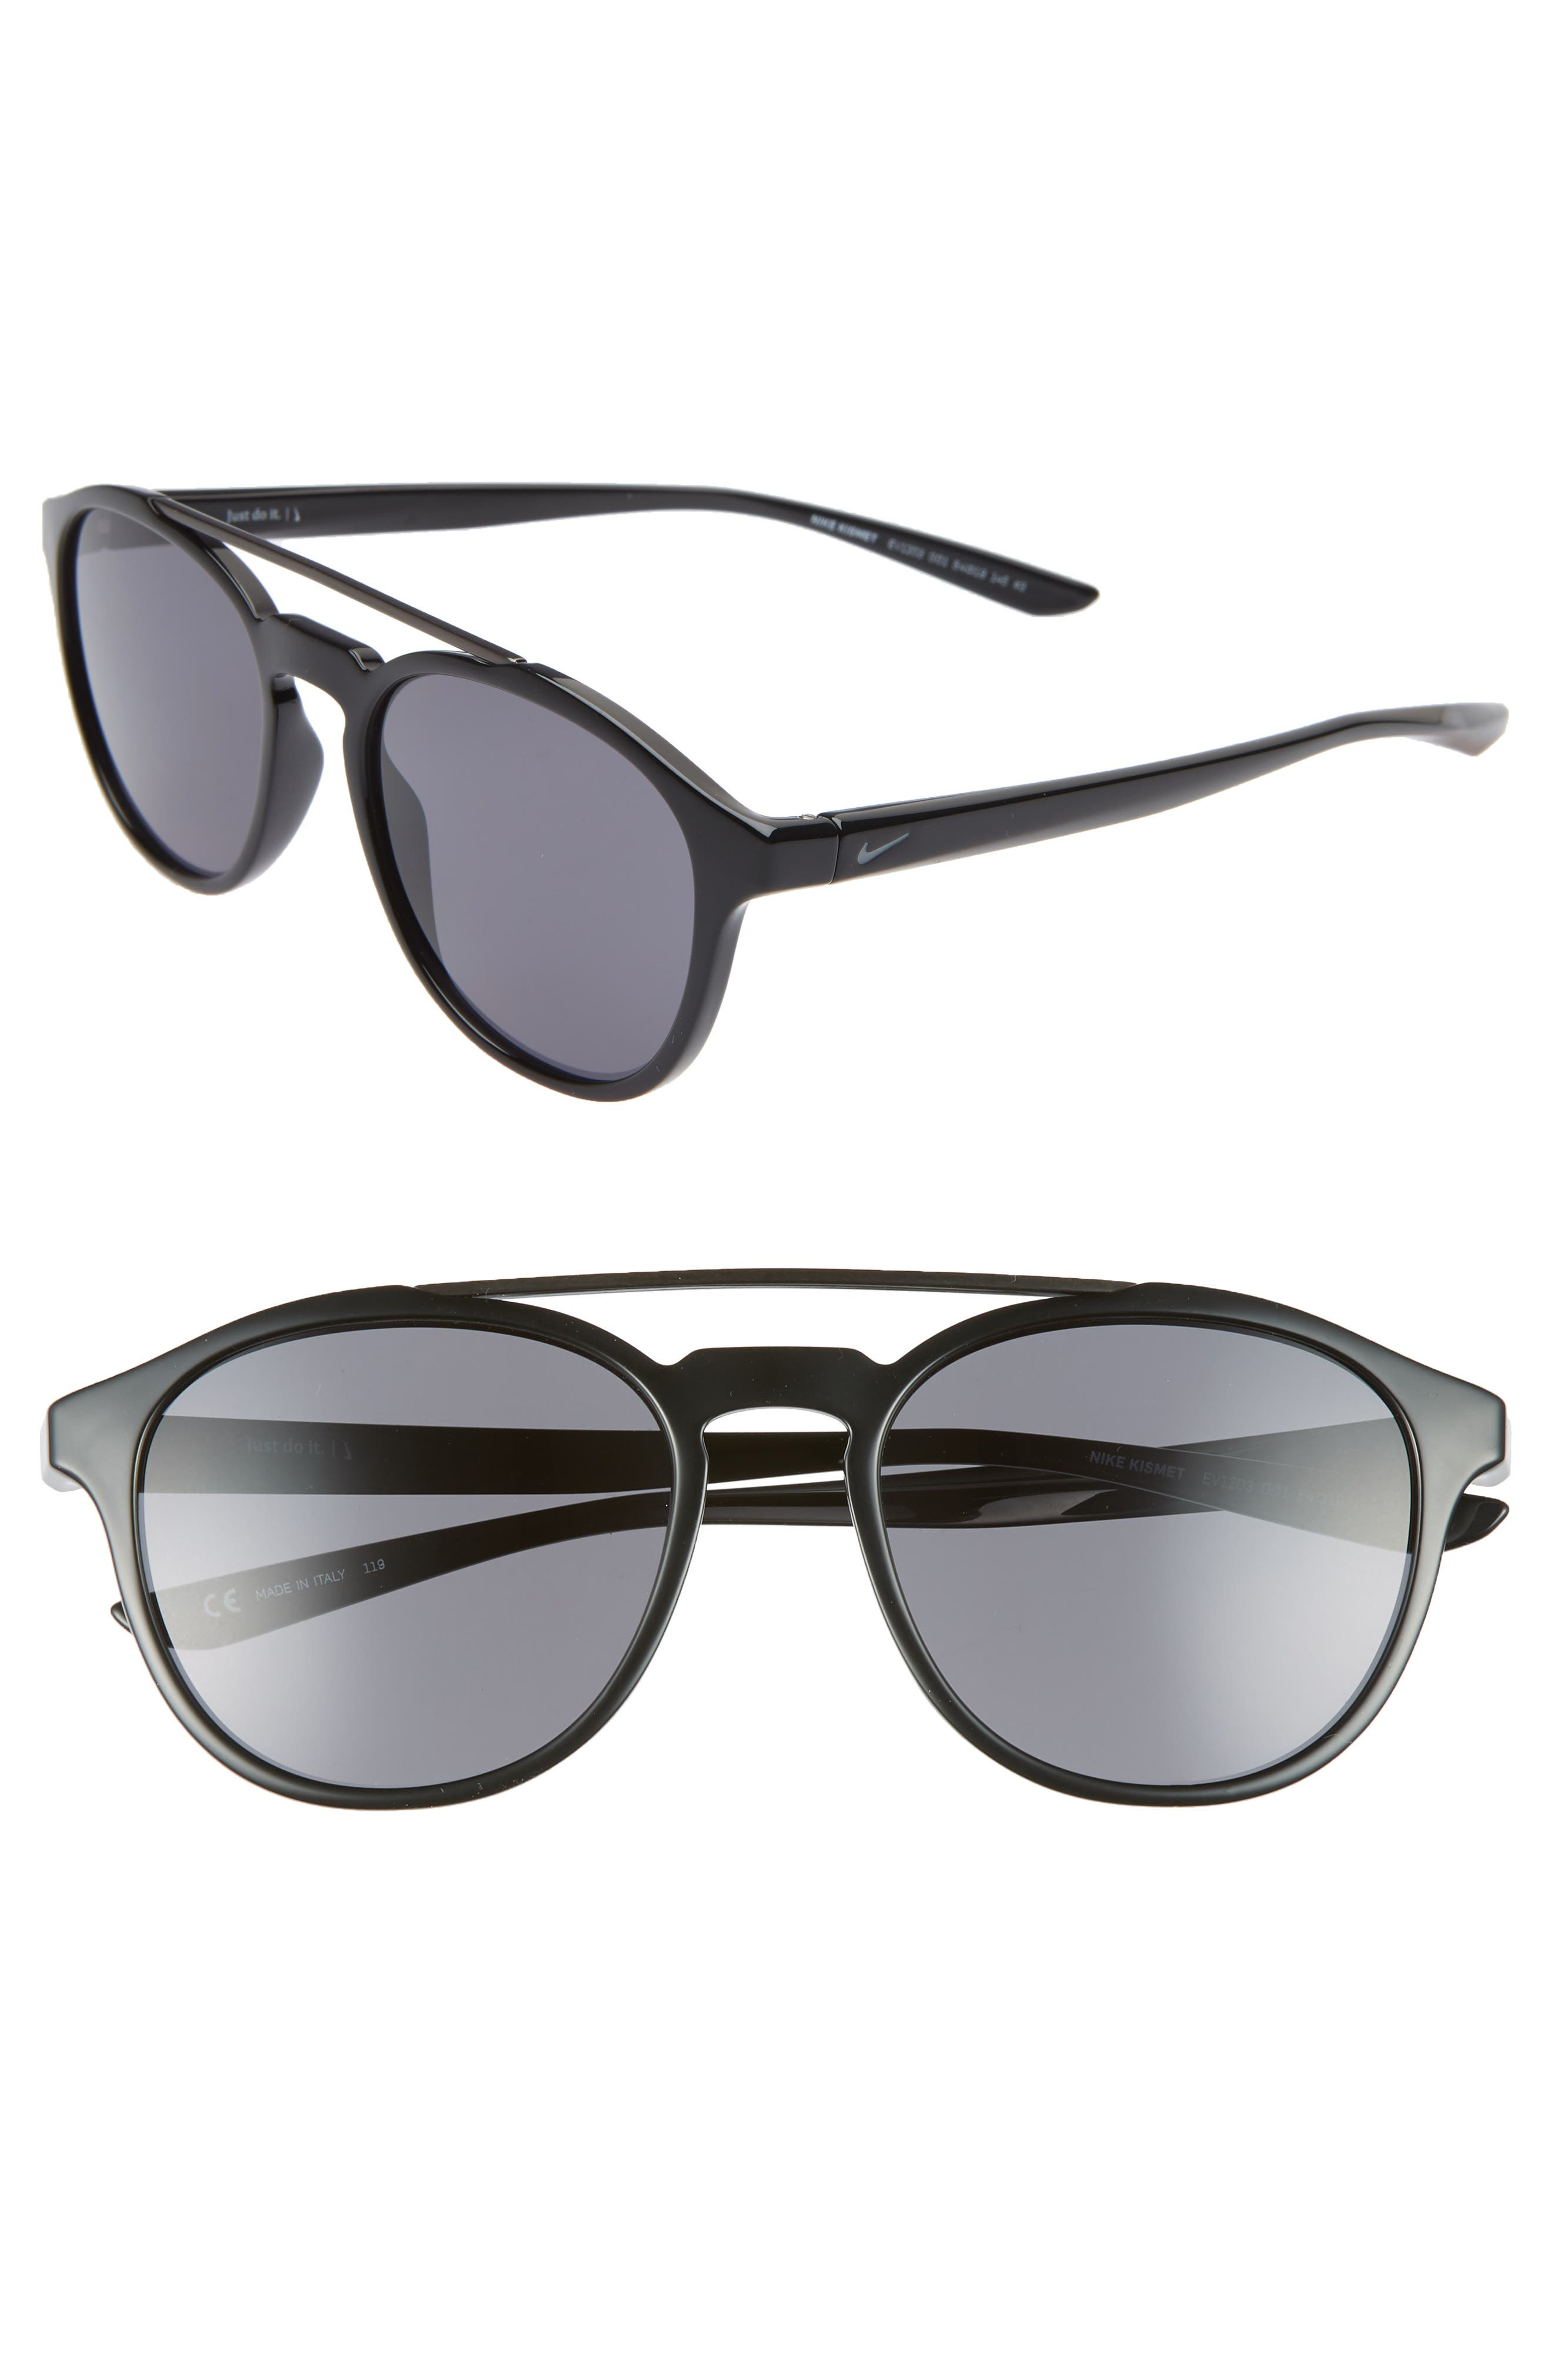 Nike Kismet 5m Round Sunglasses - Black/ Dark Grey